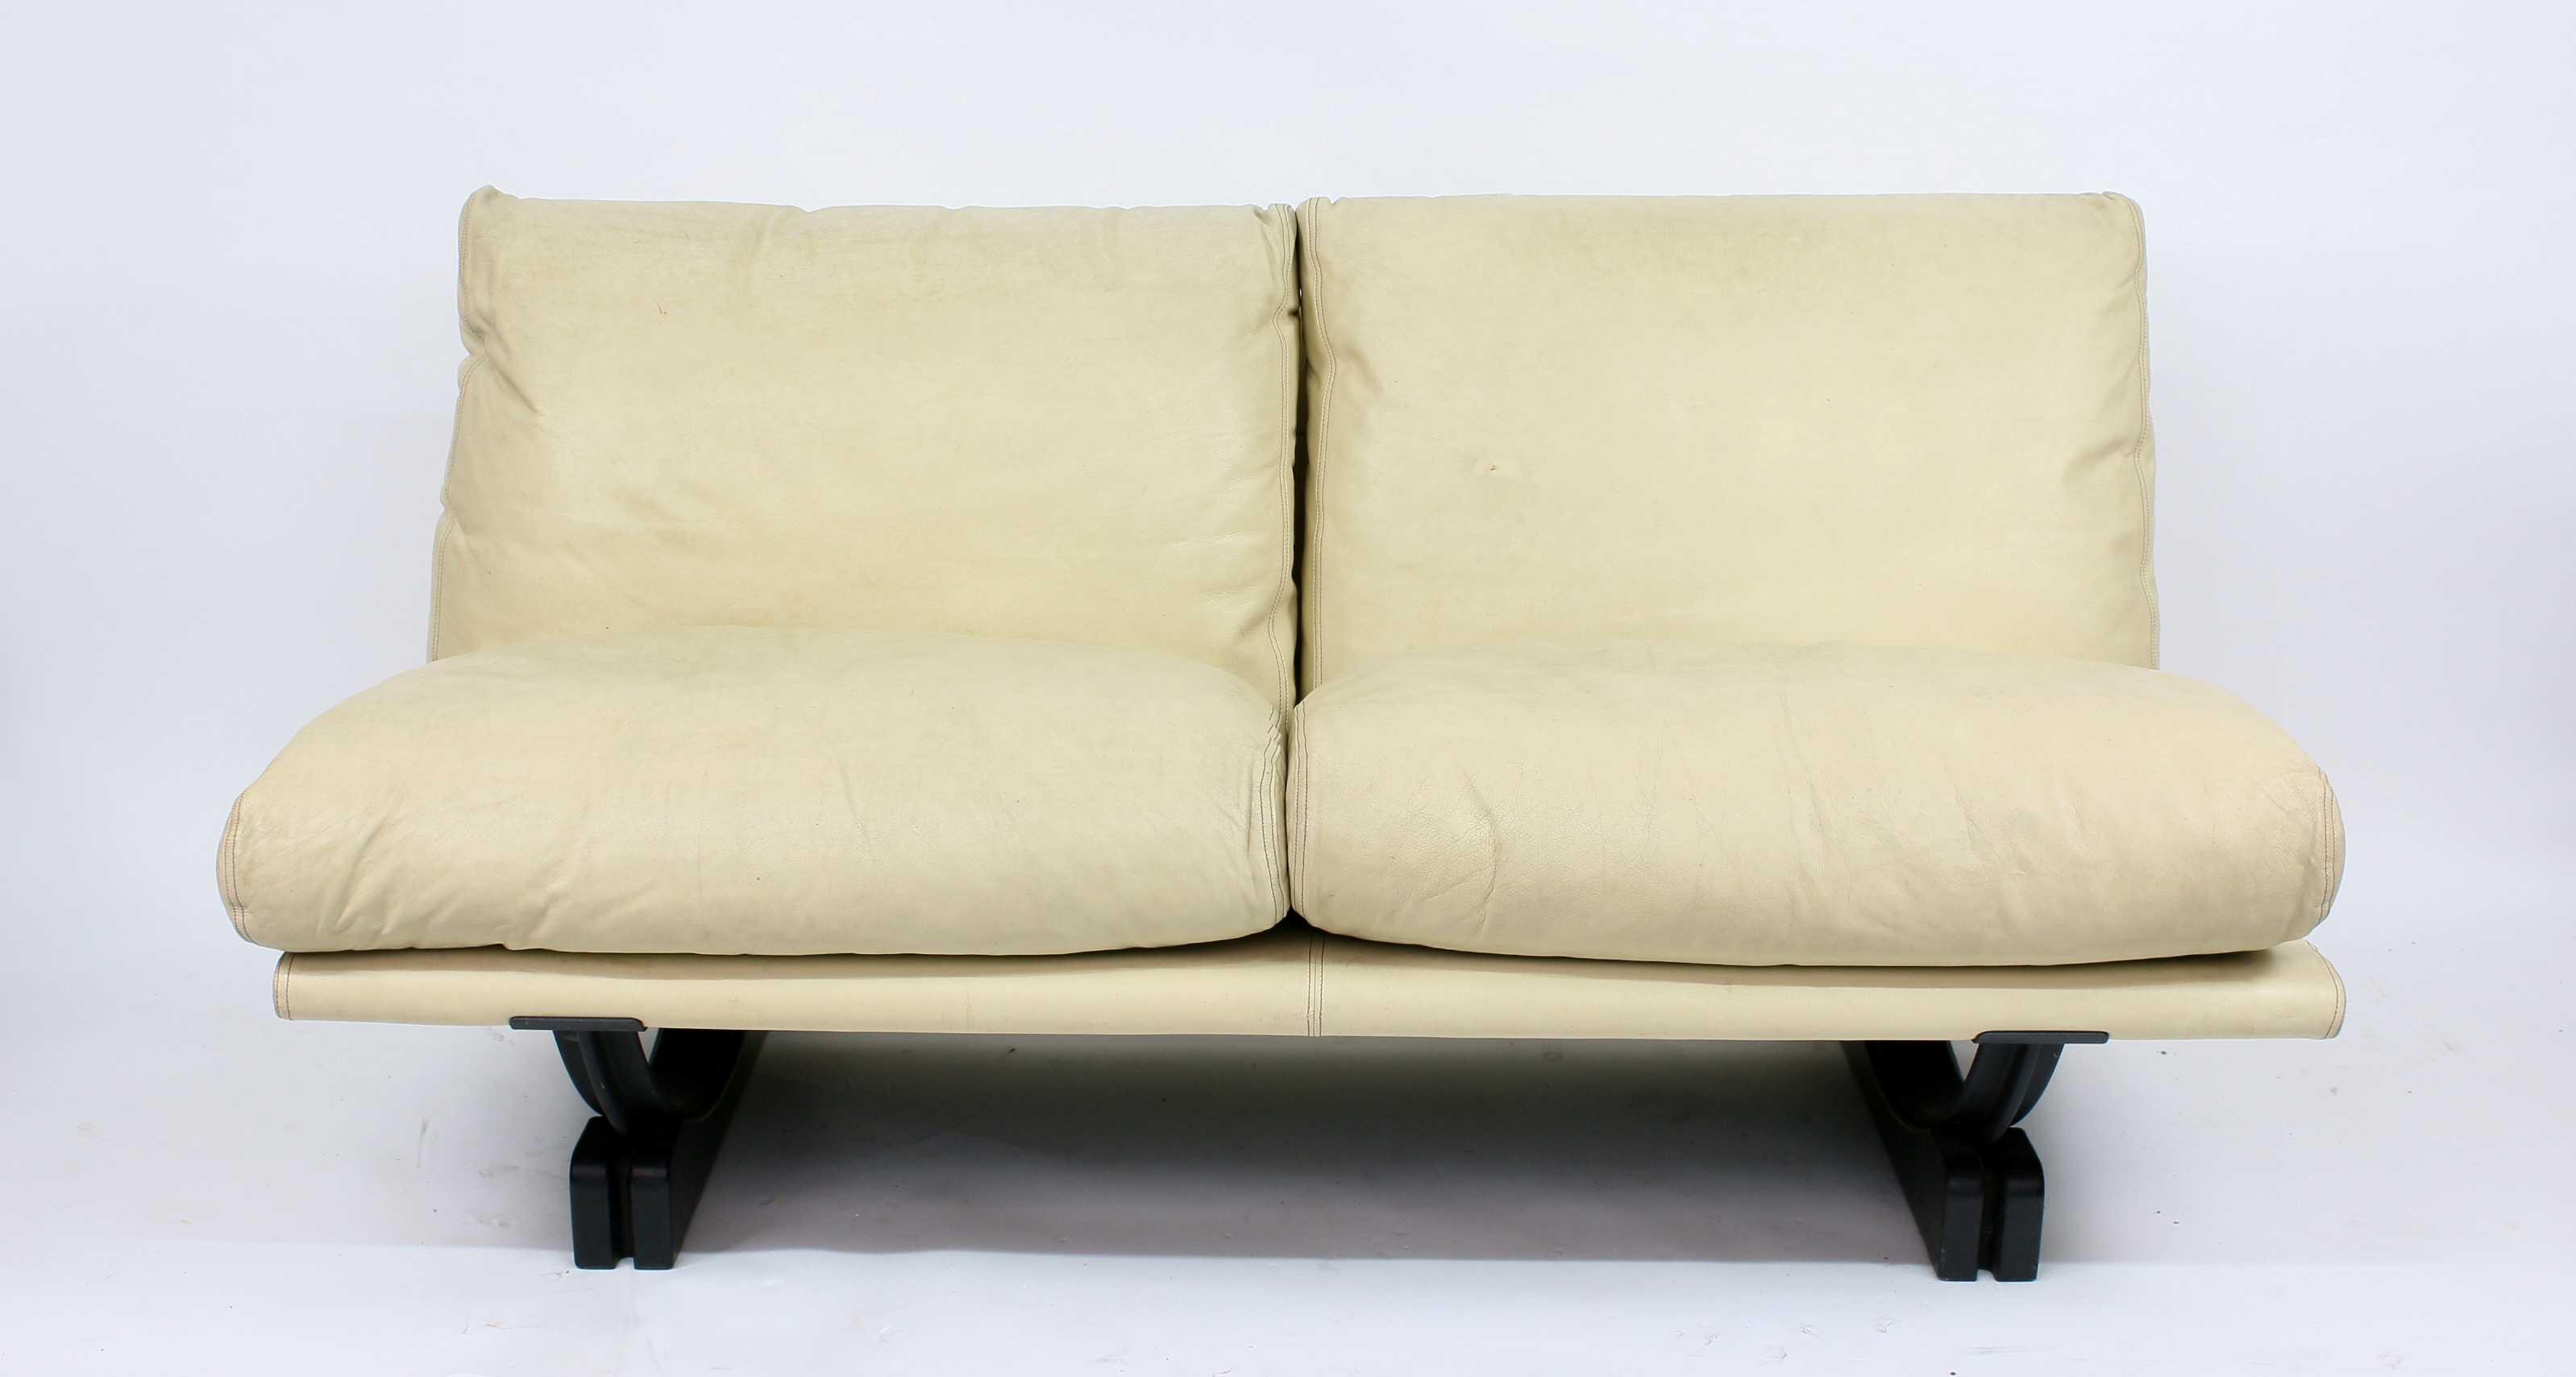 canap poltrona frau mobilier du xx me si cle. Black Bedroom Furniture Sets. Home Design Ideas